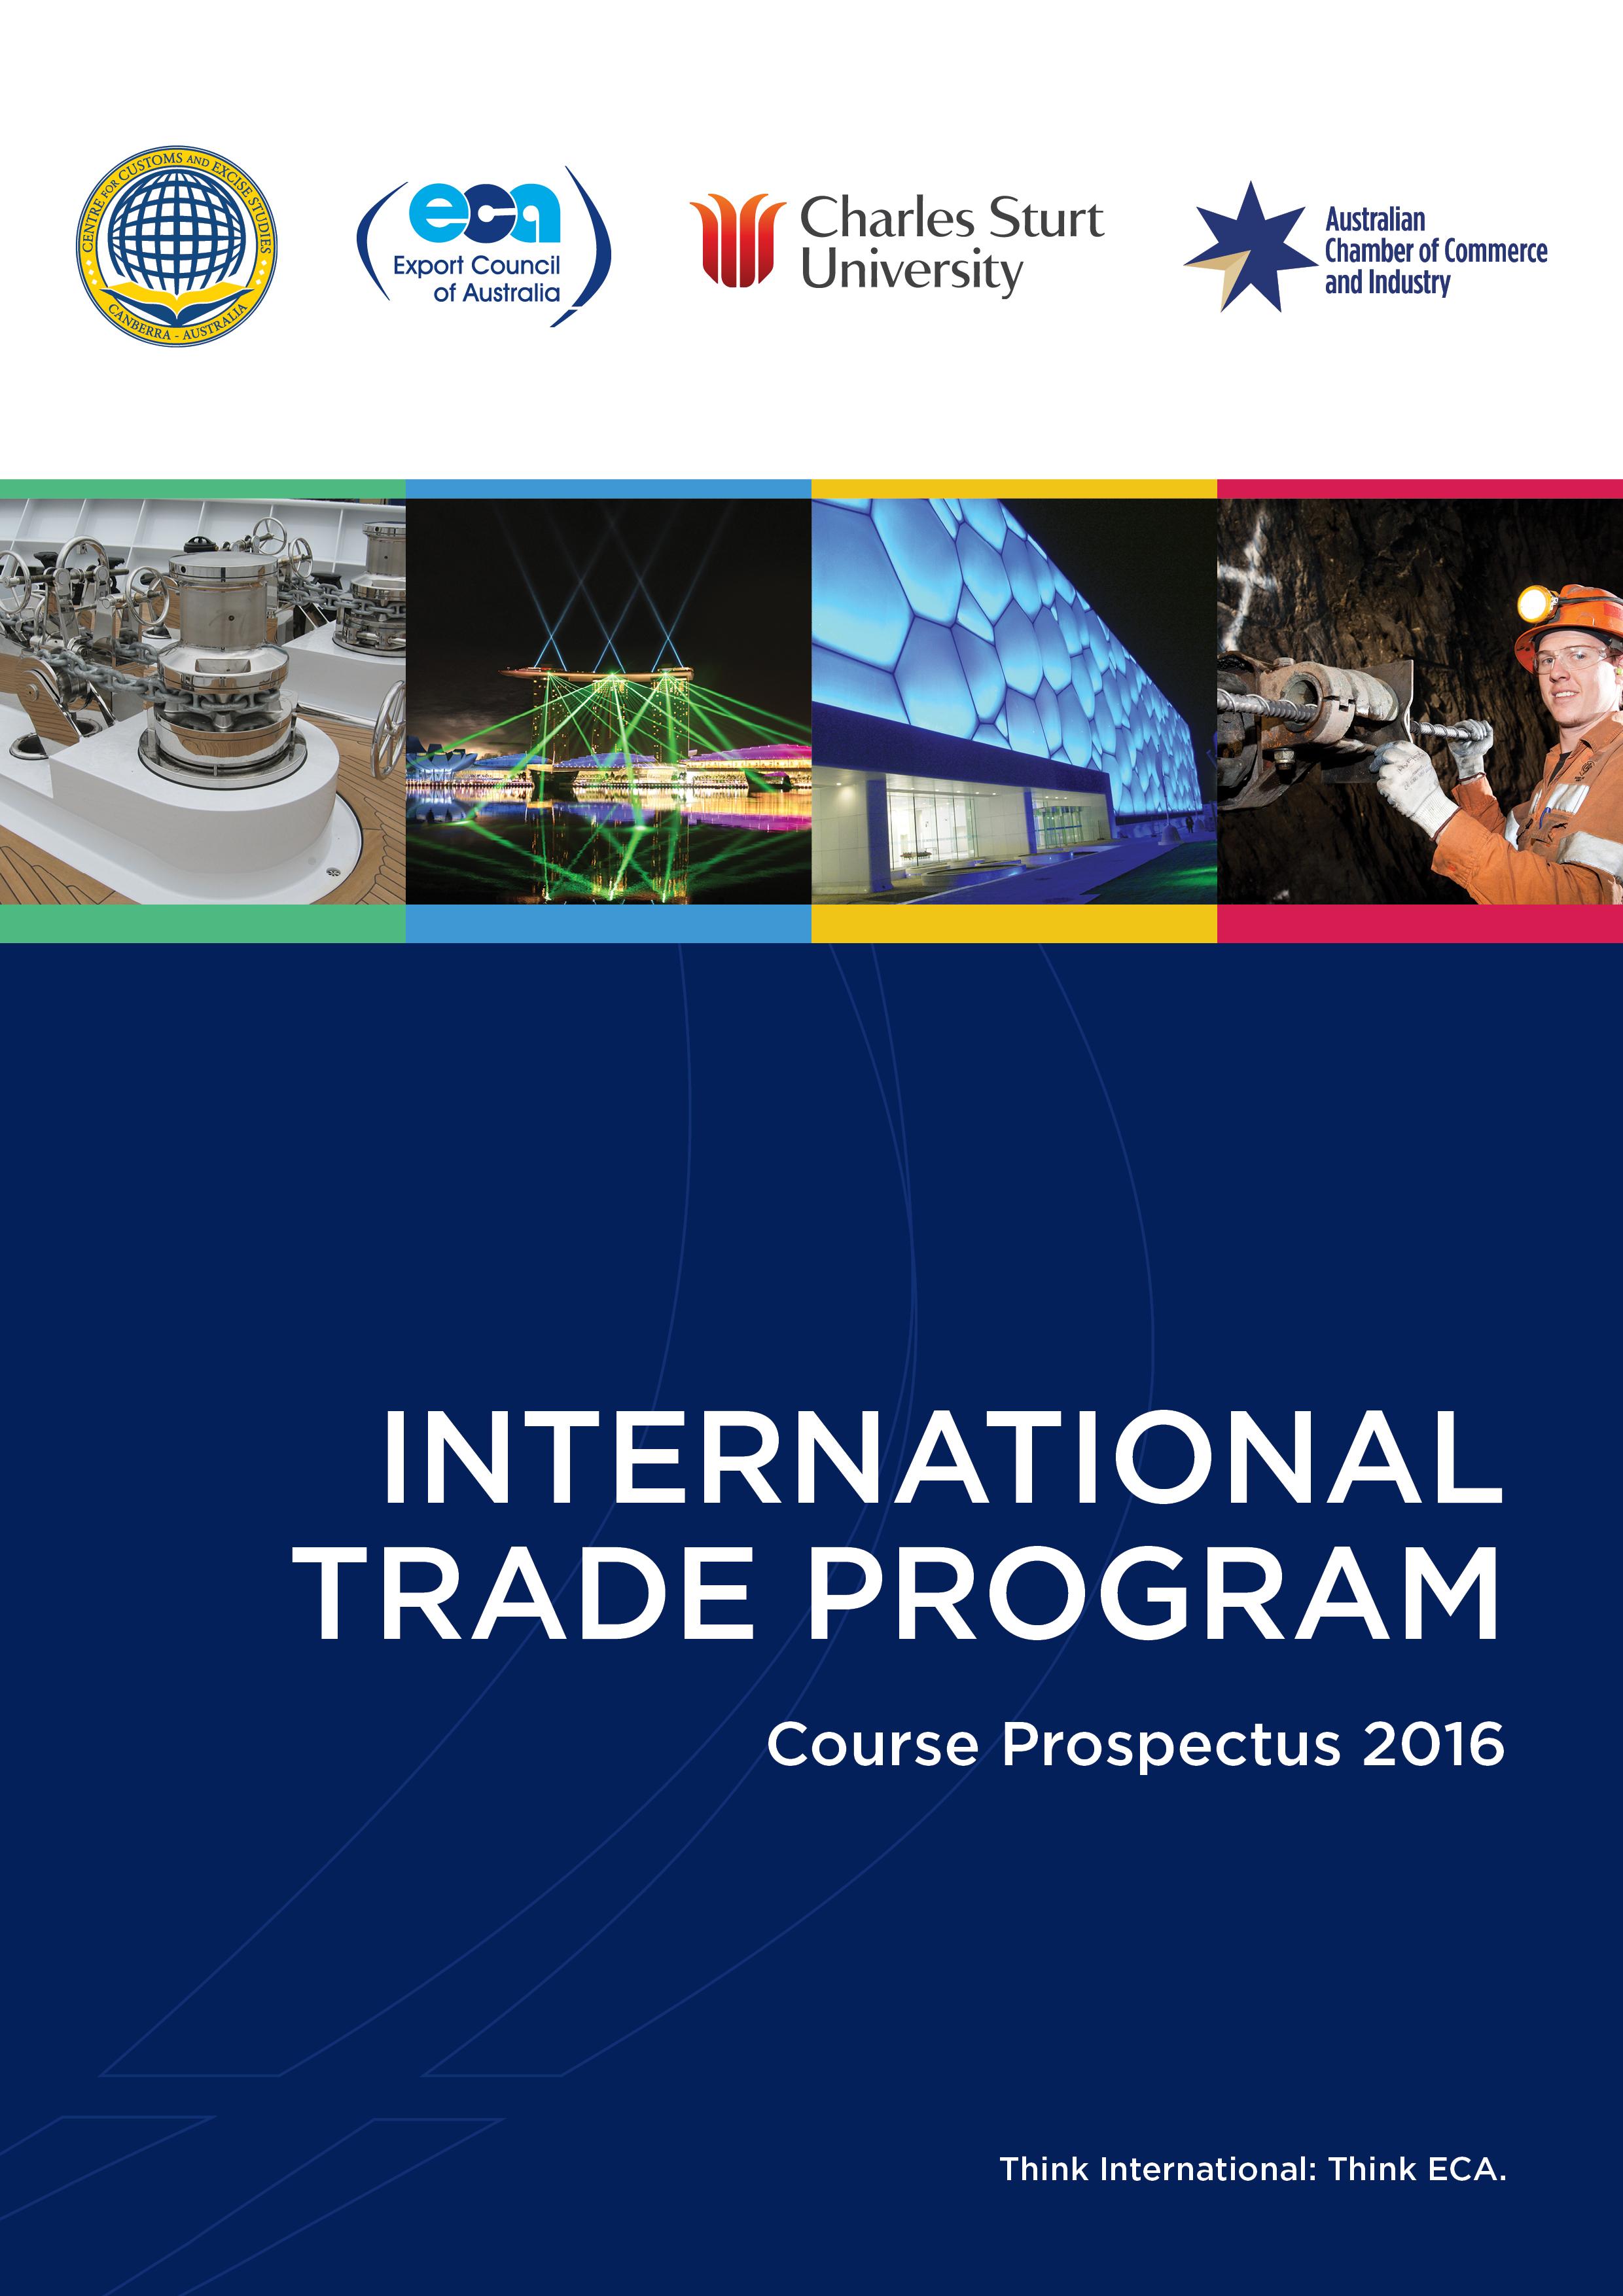 course-prospectus-cover-20160506.jpg